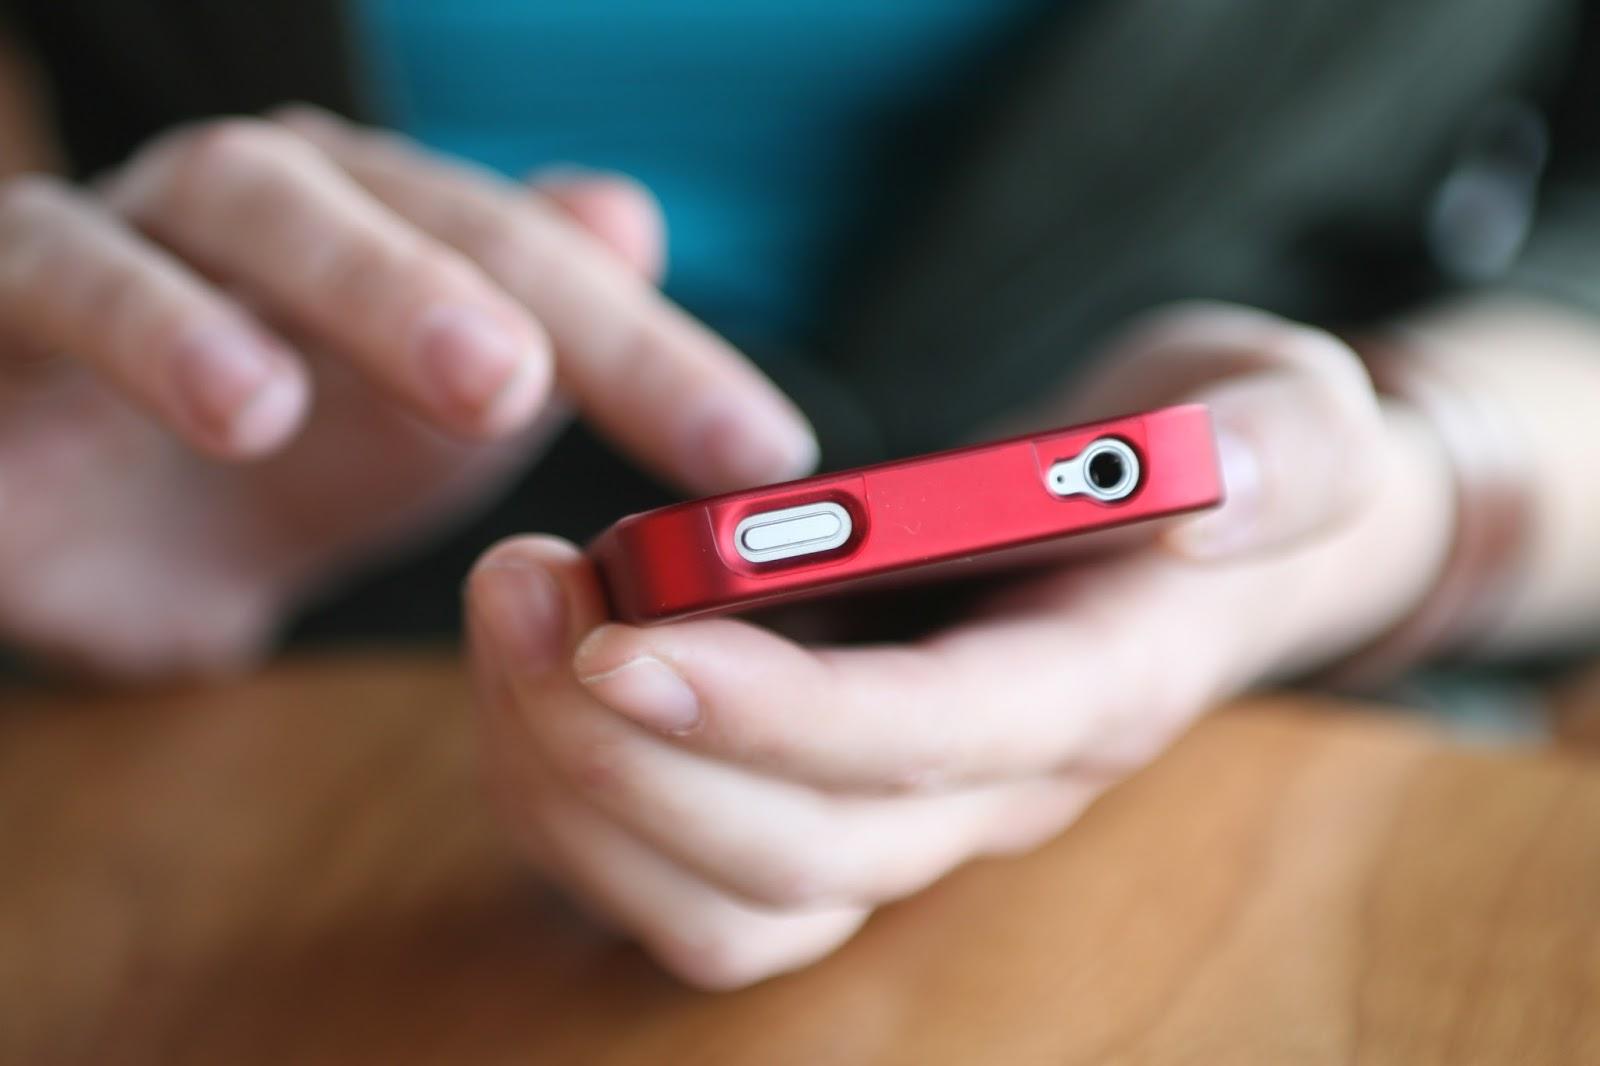 Smartphone Ini Mah Gitu Orangnya